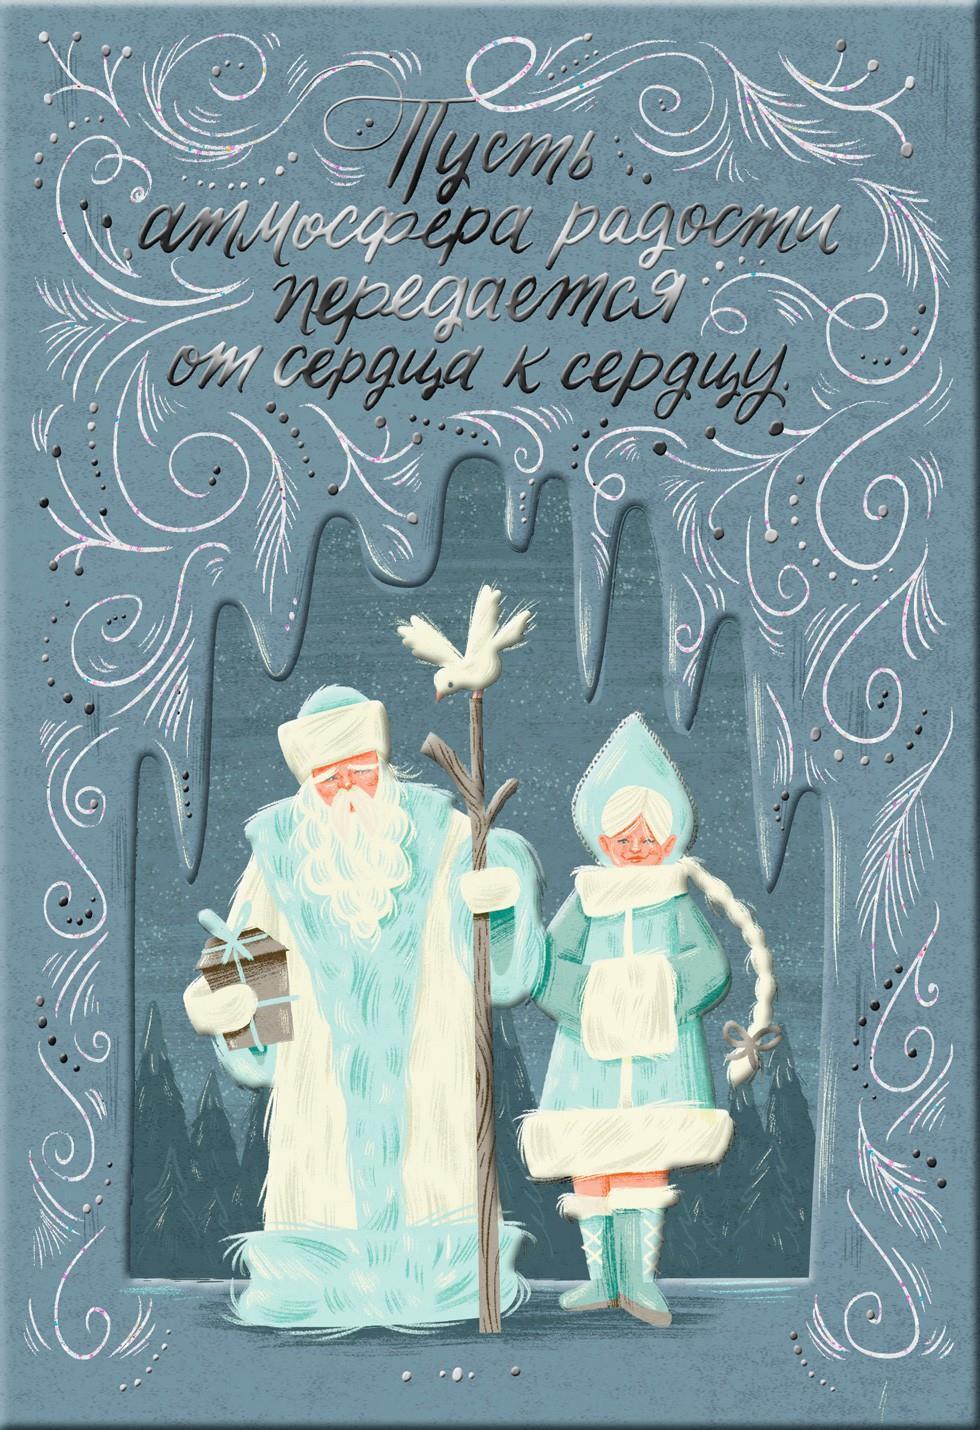 Heritage Santa Claus Russian Language Christmas Card